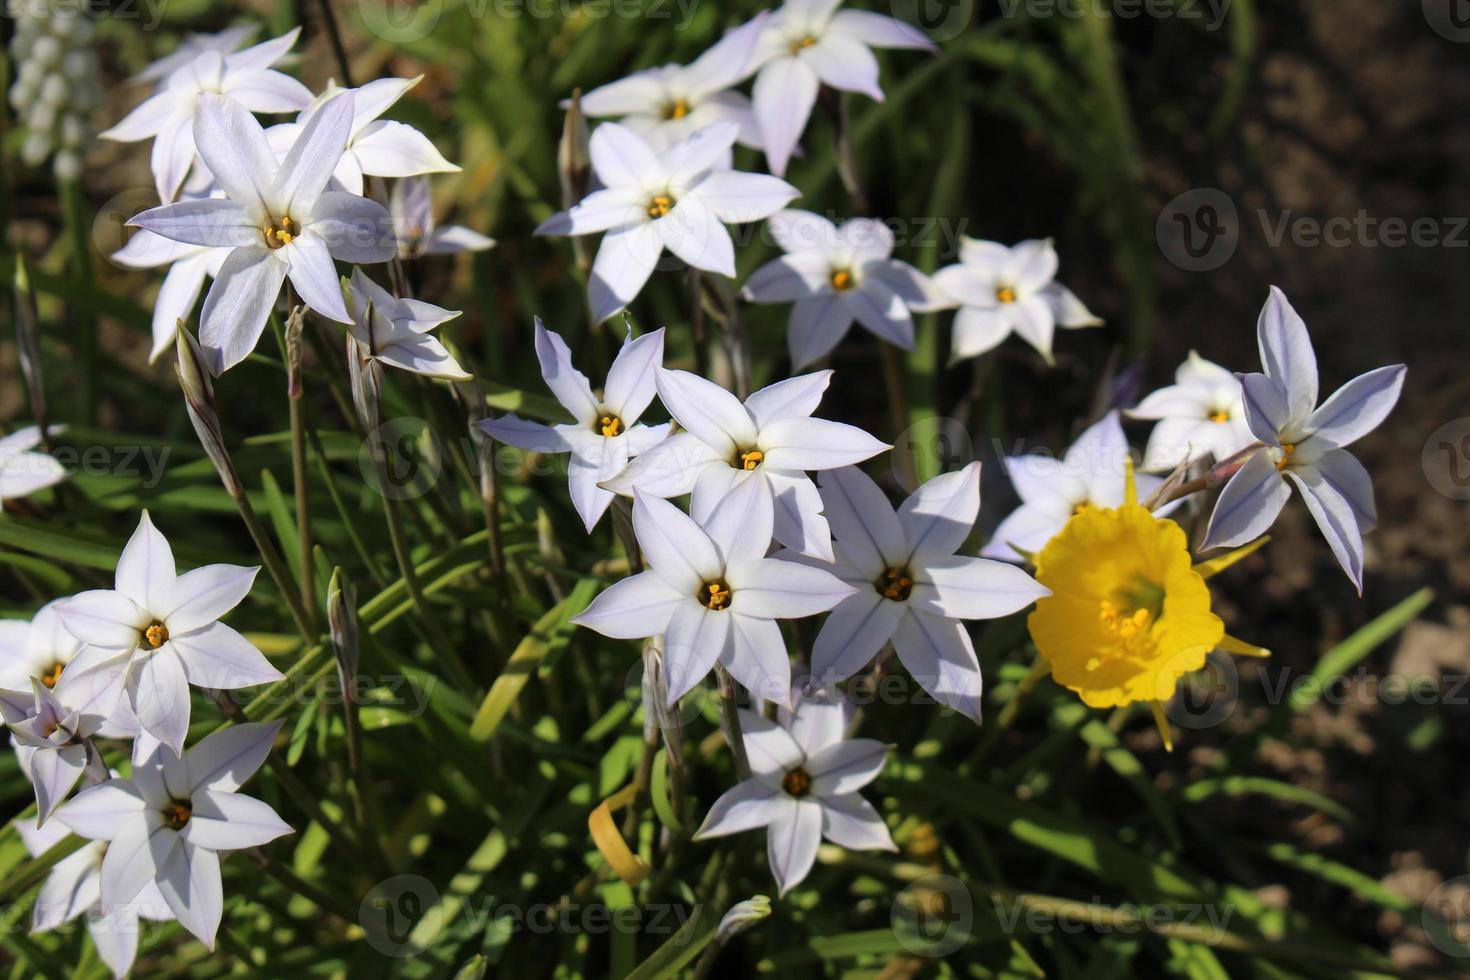 starflowers a molla (ipheion uniflorum) foto